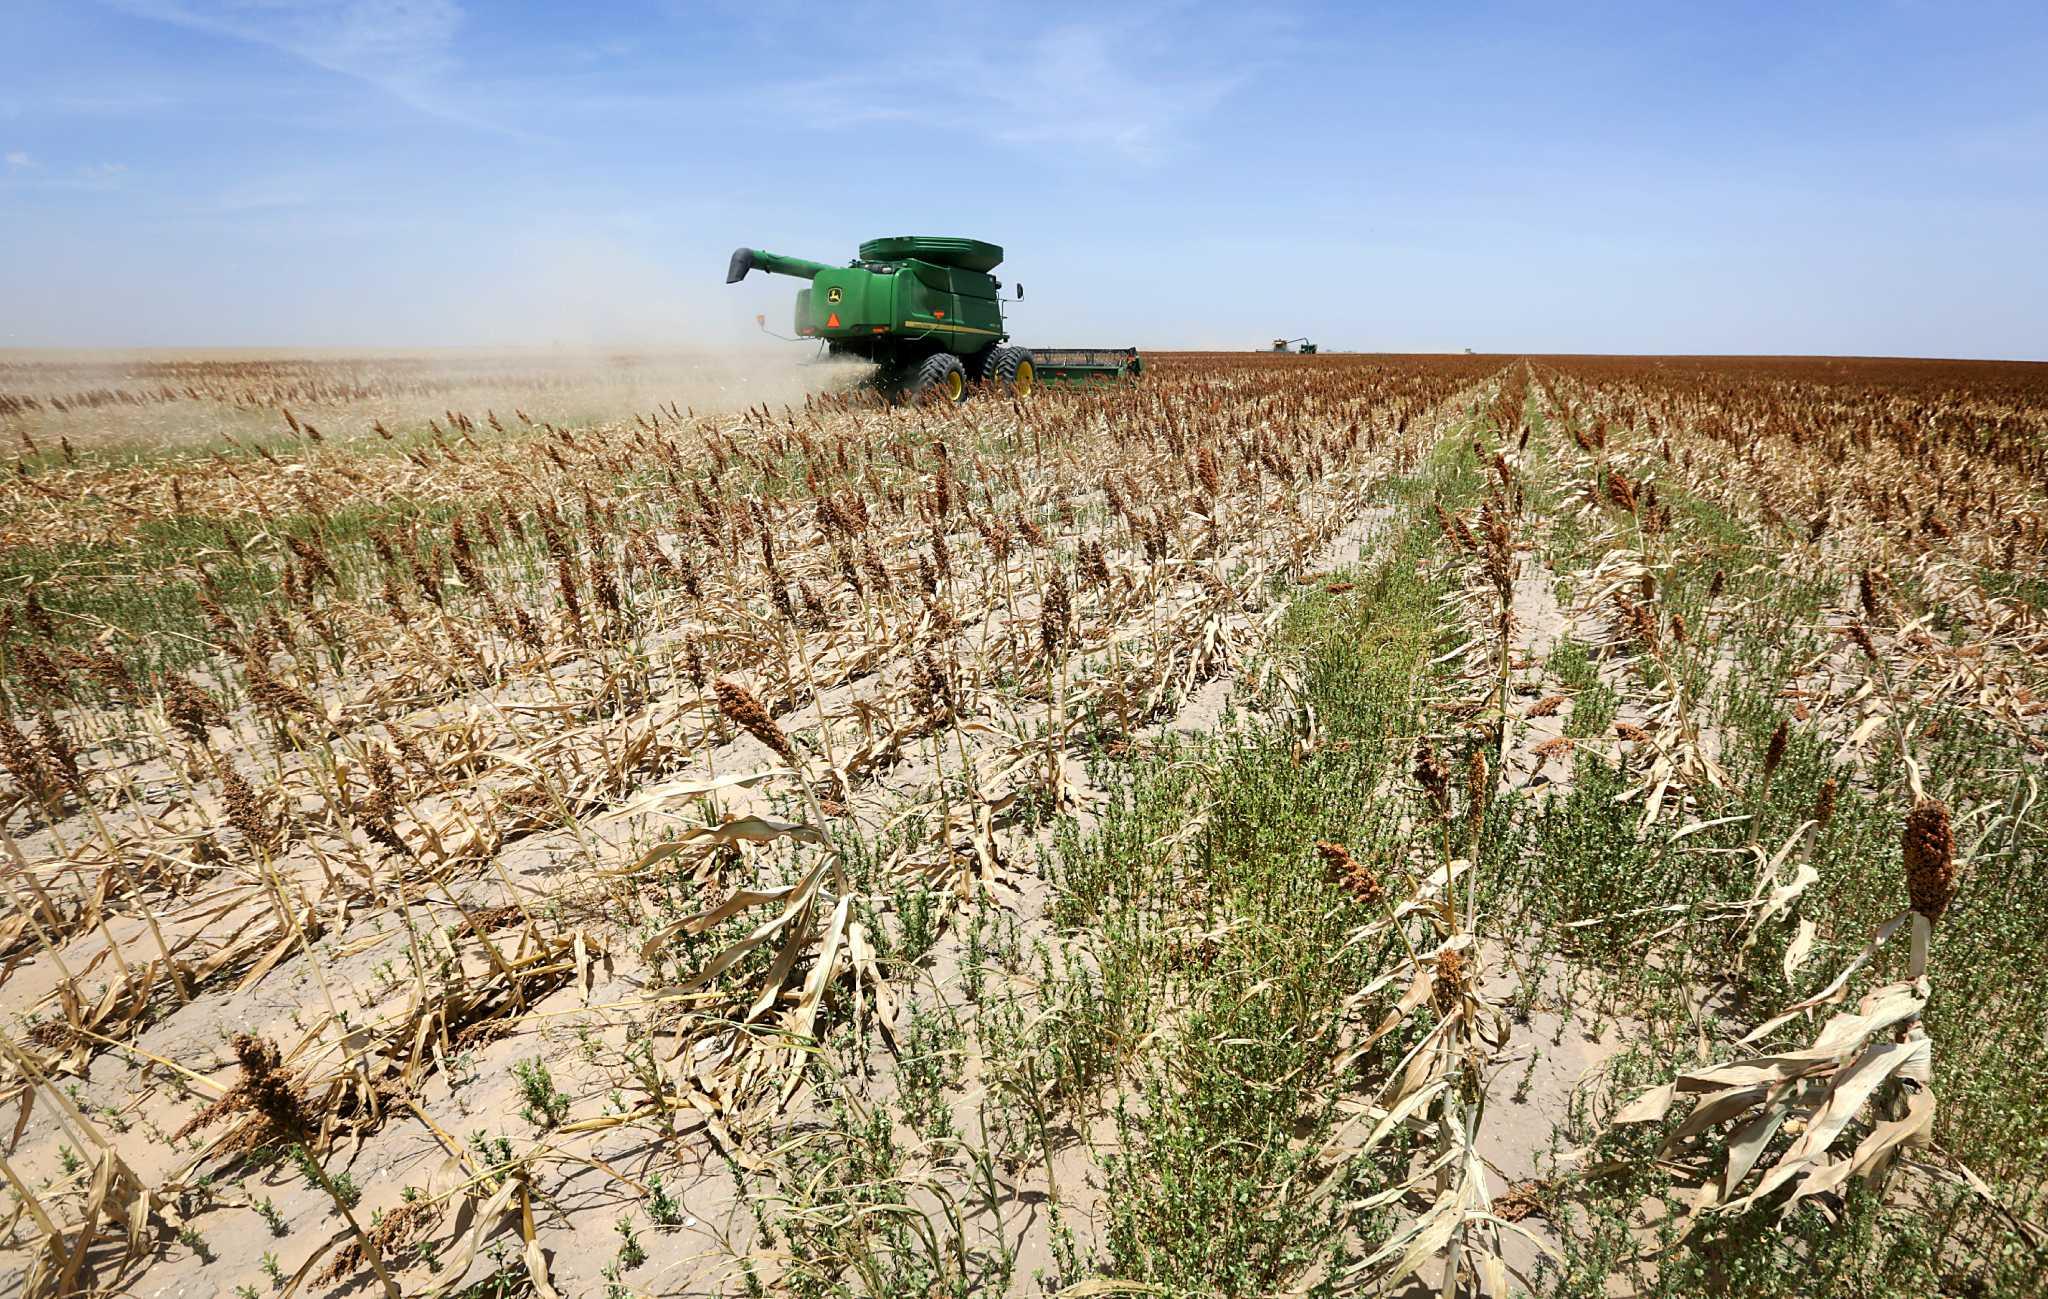 Big Farms Cause Big Problems